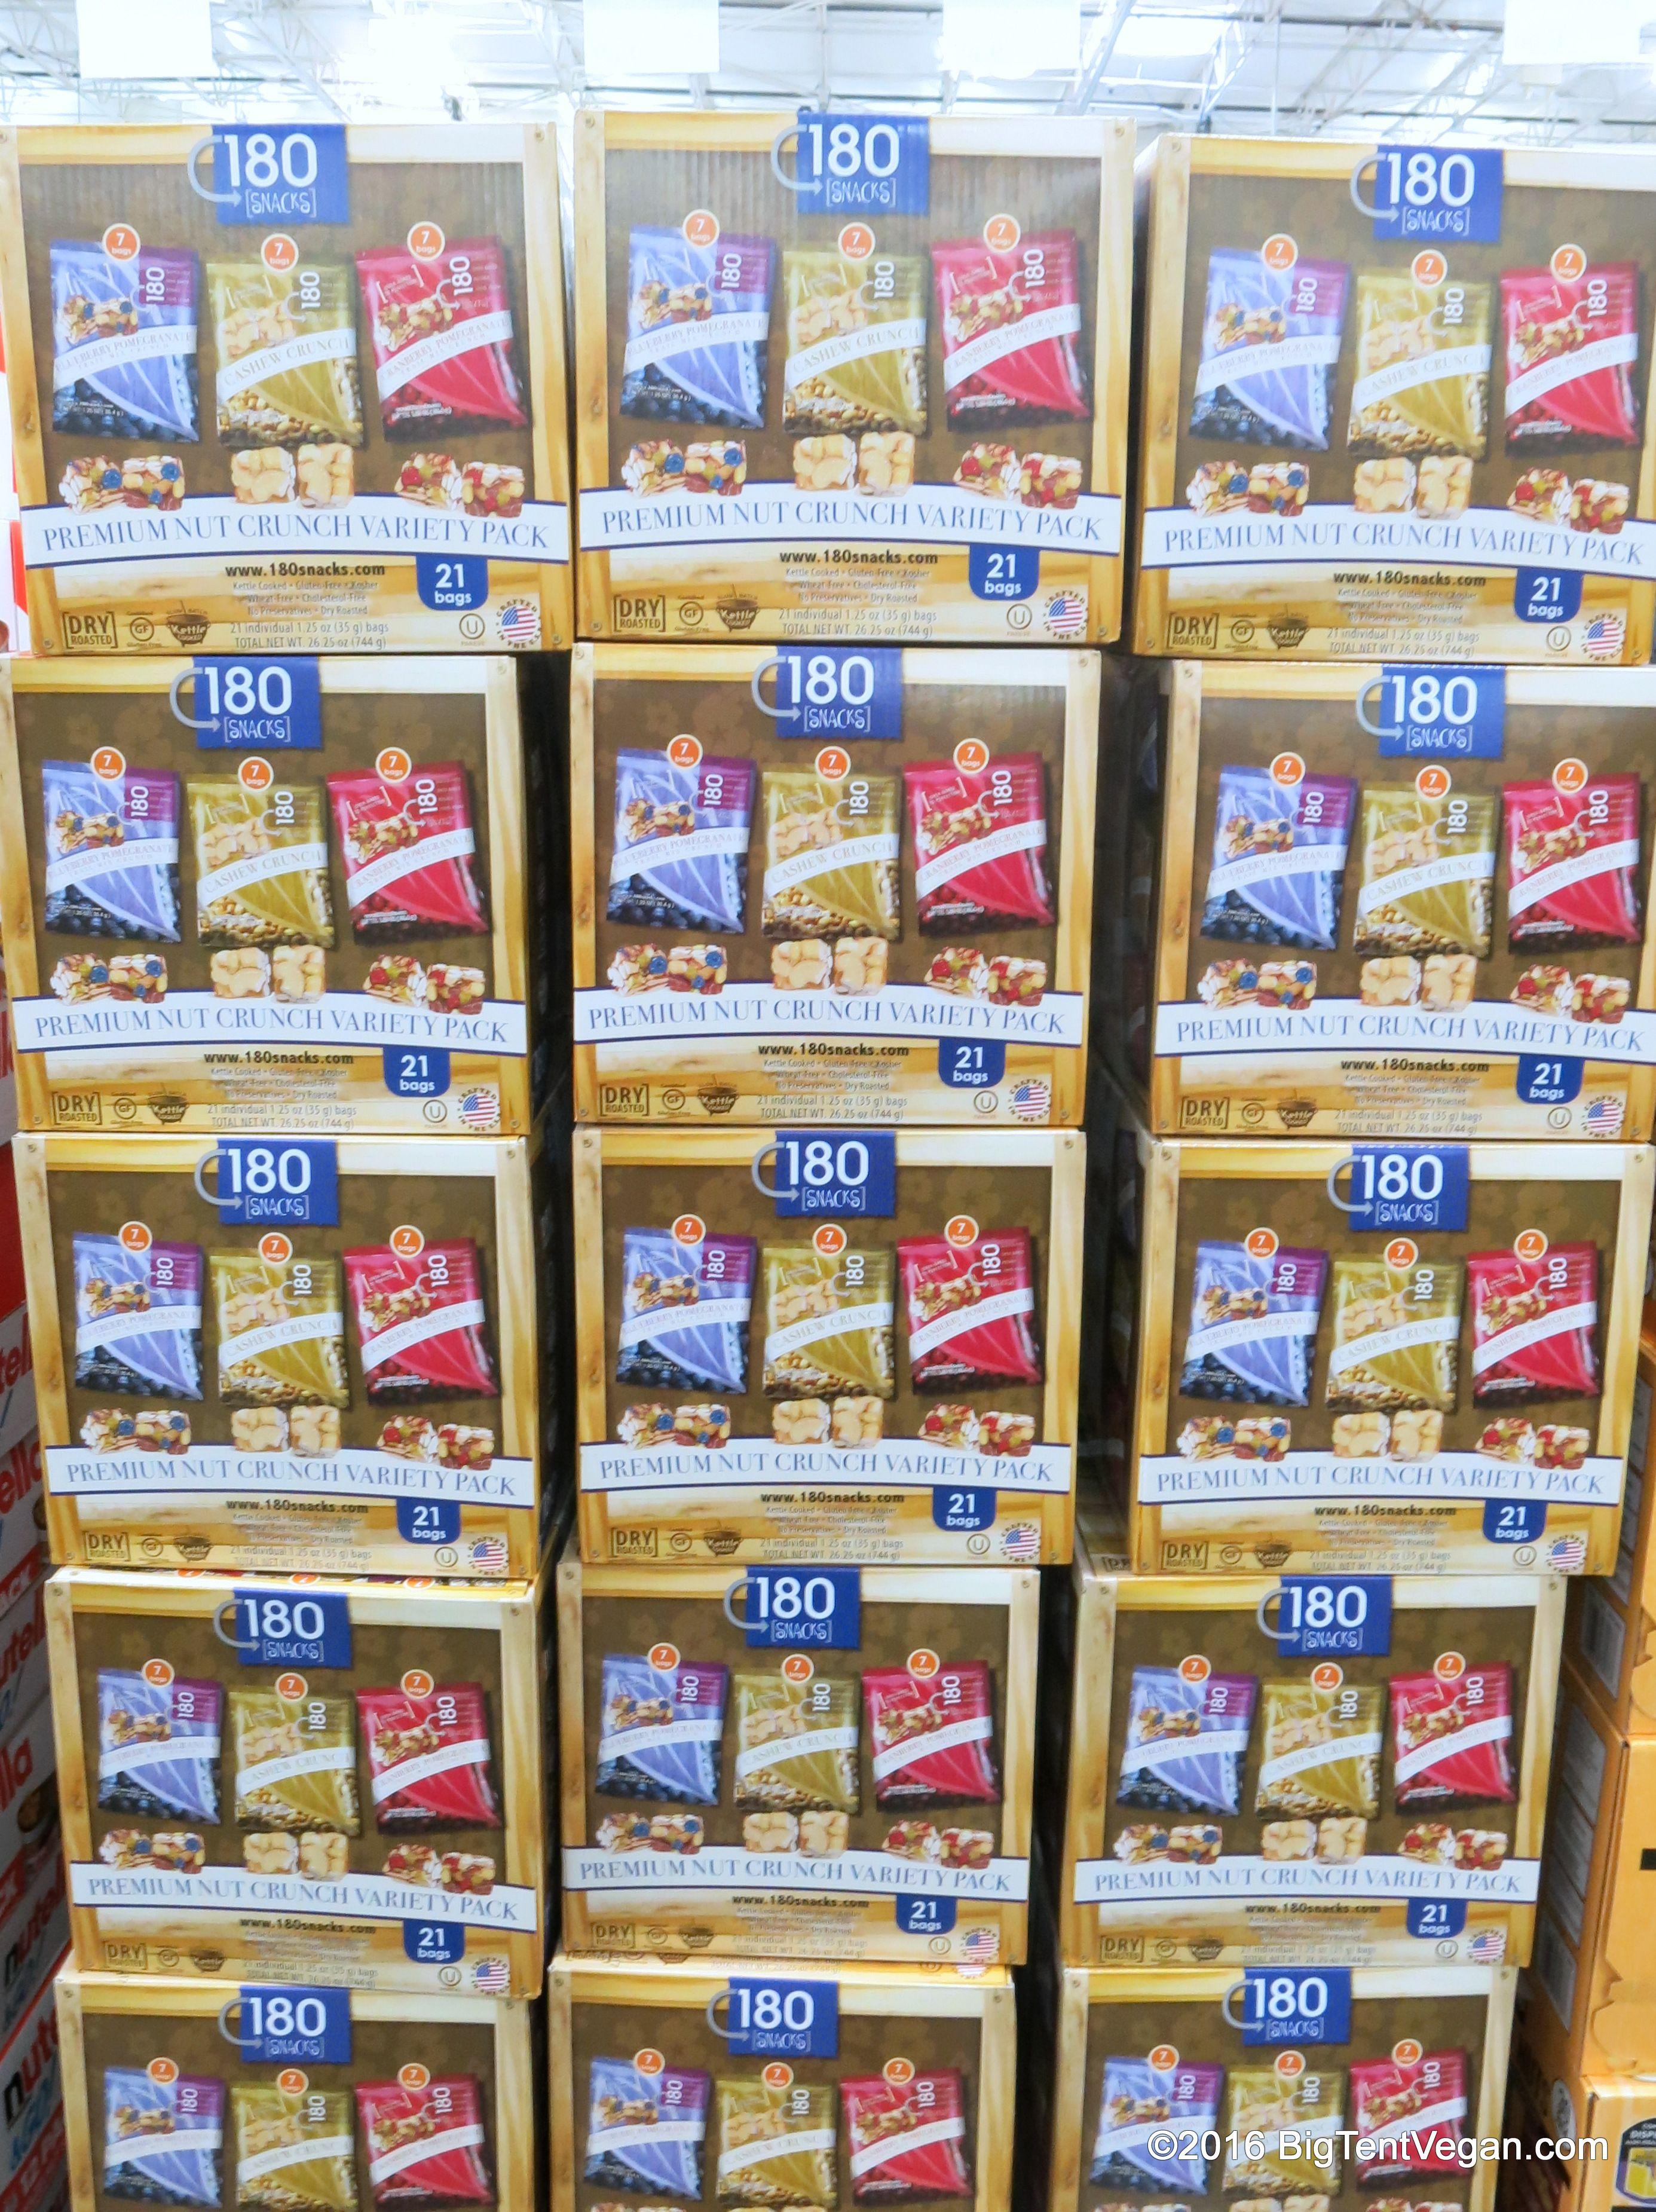 Premium Nut Crunch Variety Pack by 180° Snacks #costco